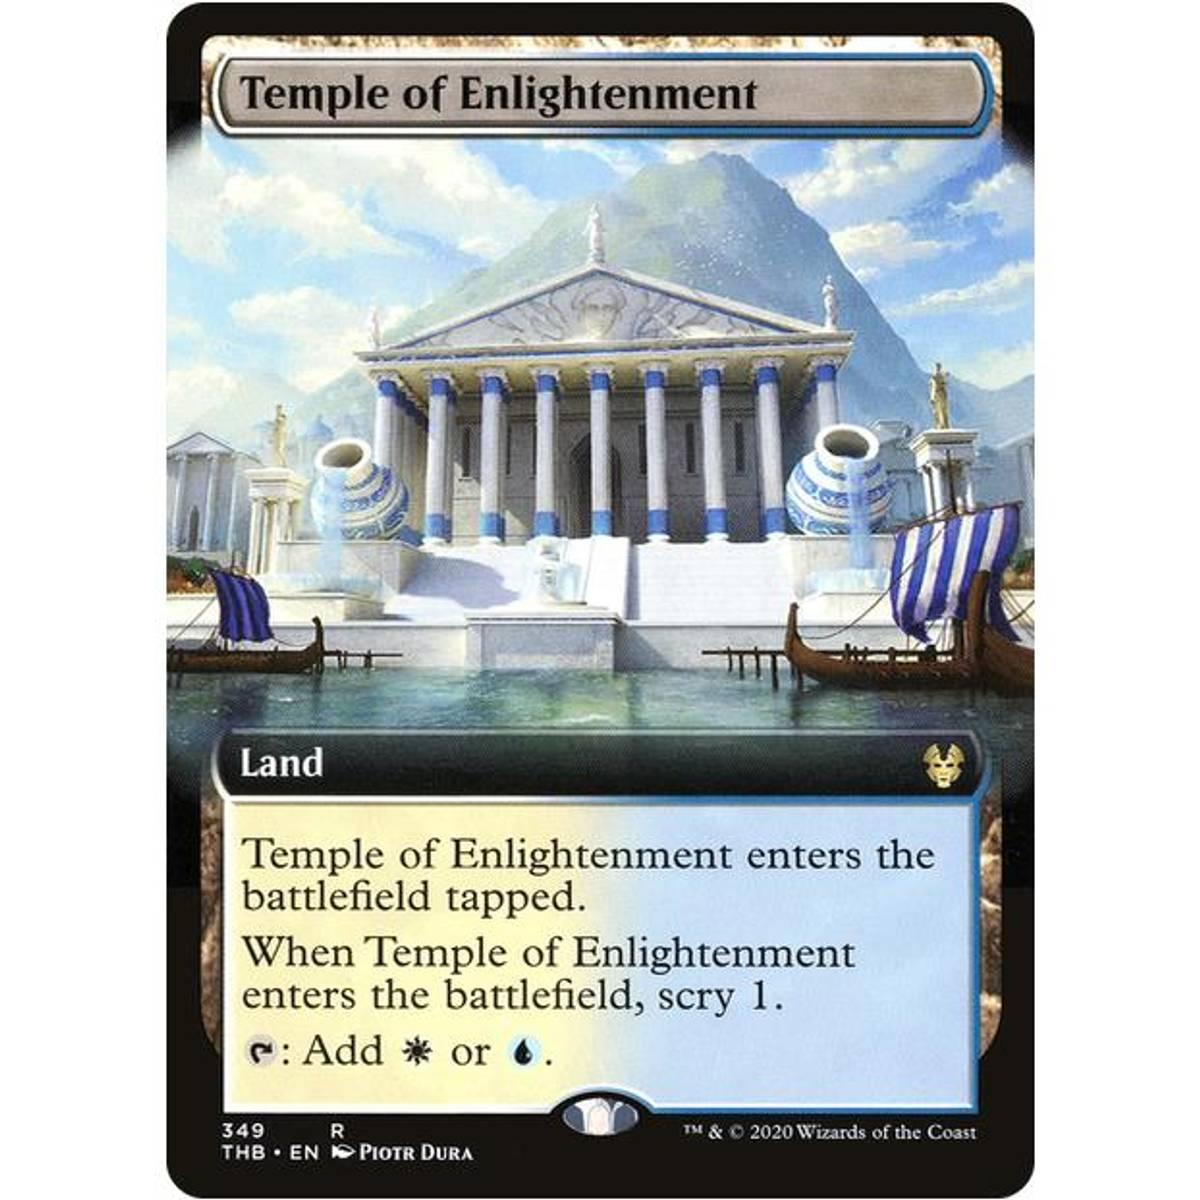 Temple of Enlightenment